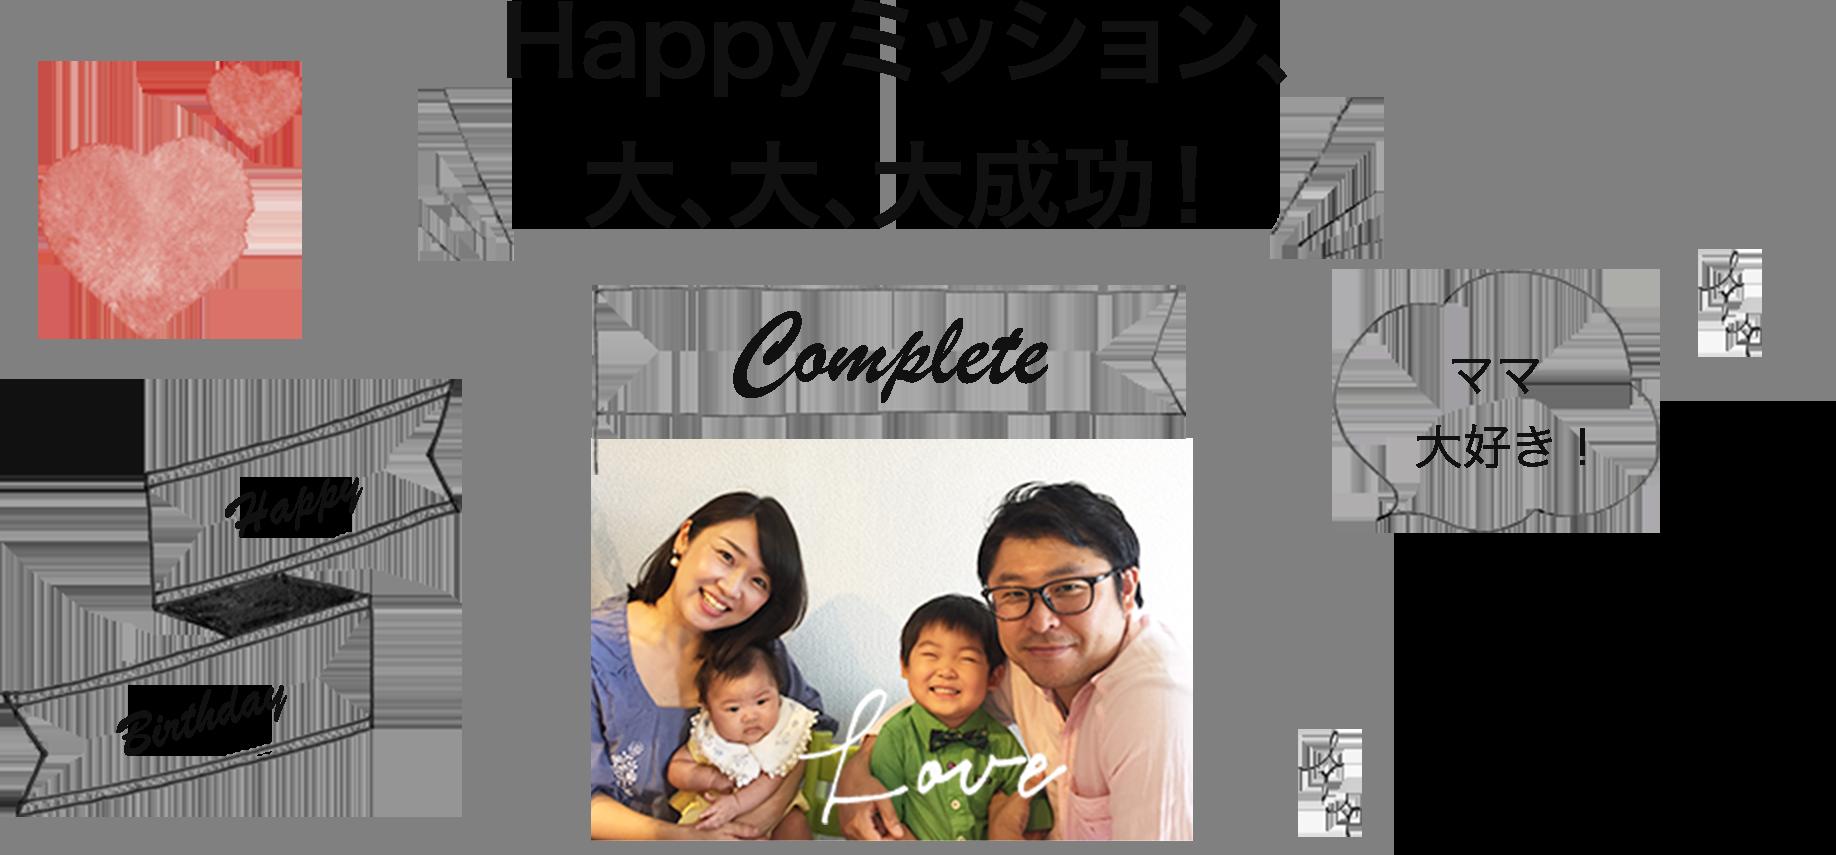 Happyミッション大、大、大成功!「ママ大好き」最後はみんな笑顔で家族写真。